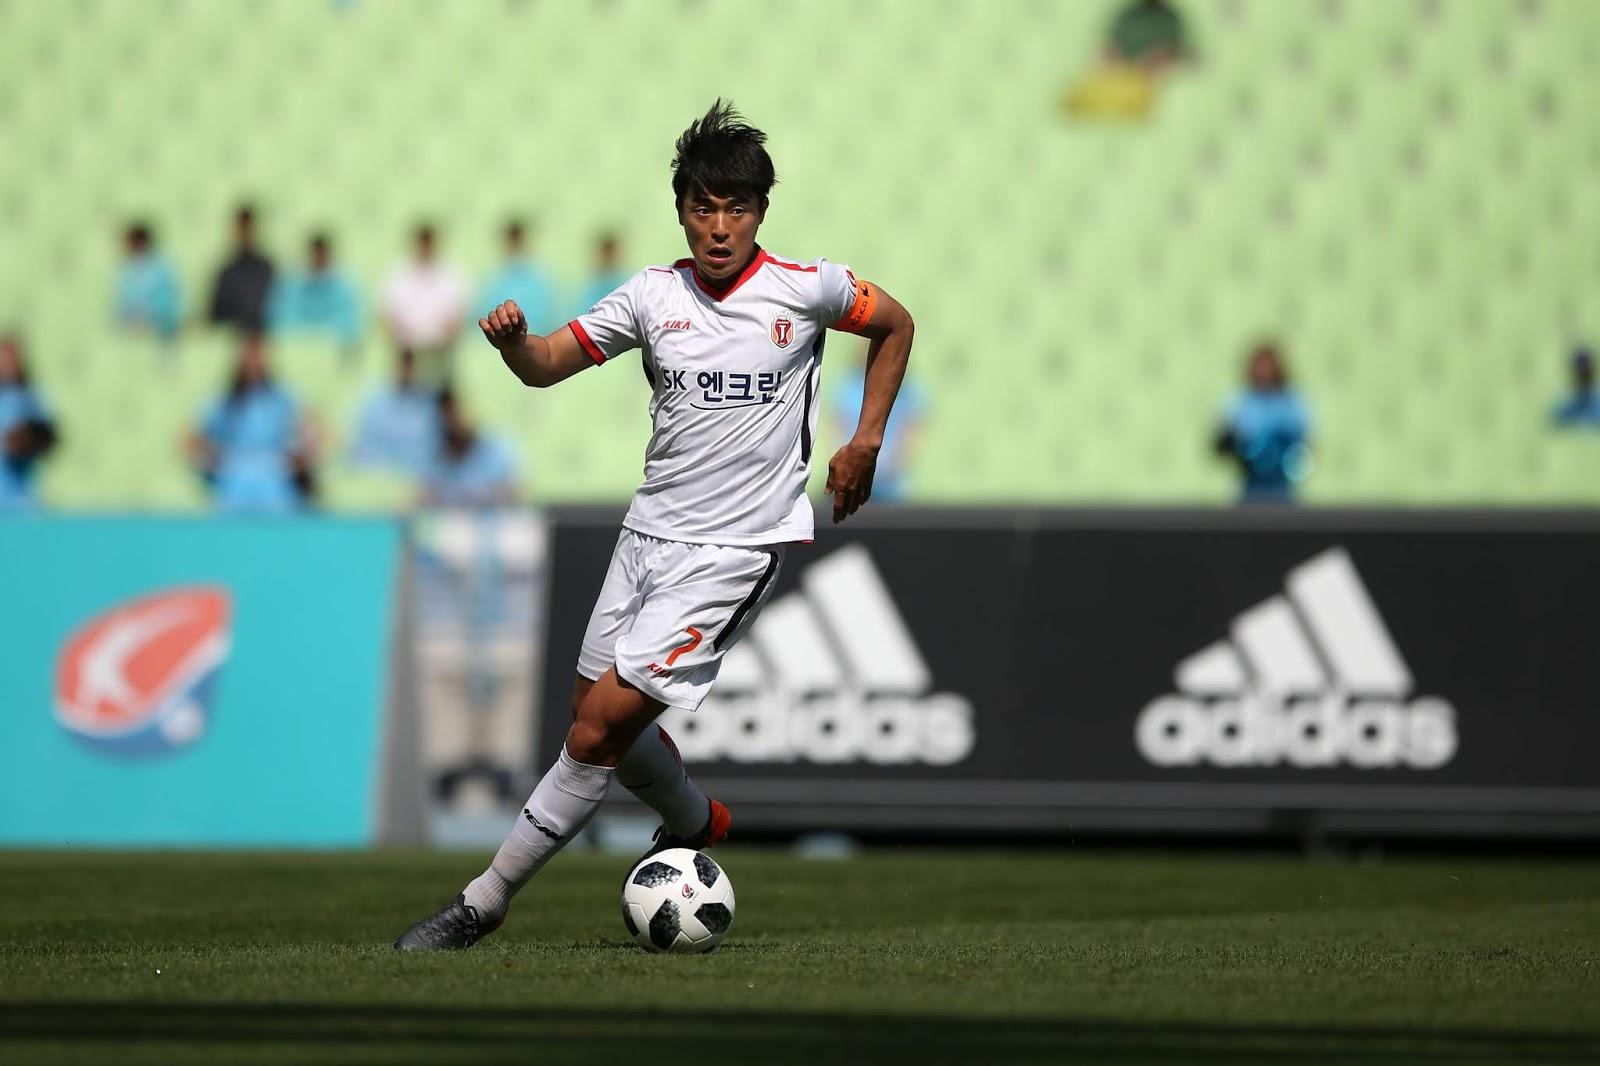 K League 1 Preview: Sangju Sangmu vs Jeju United